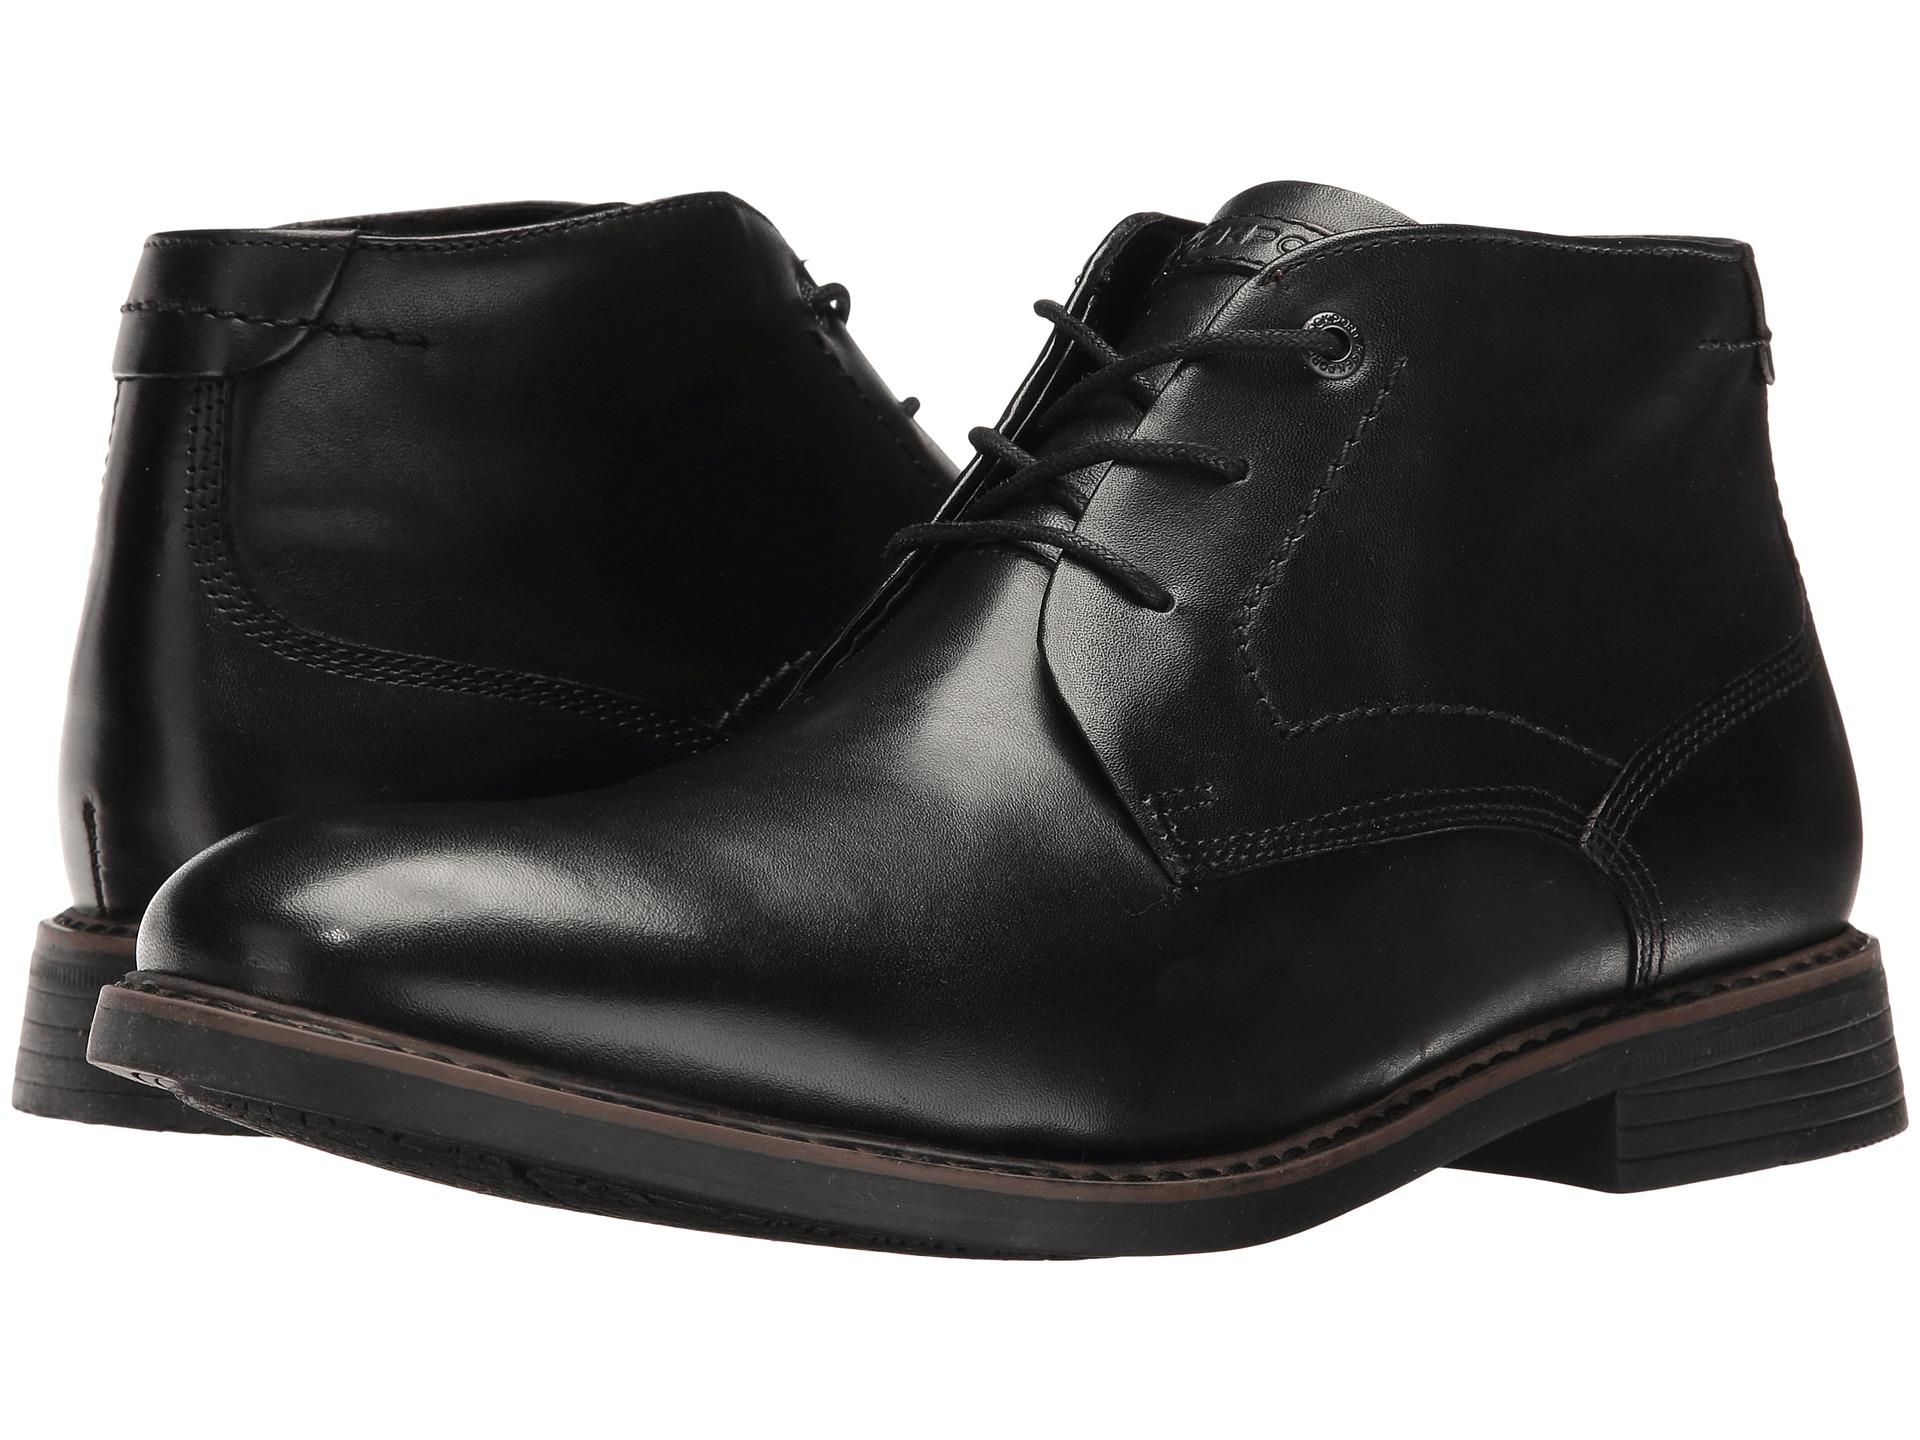 Boots, Chukka, Men | Shipped Free at Zappos